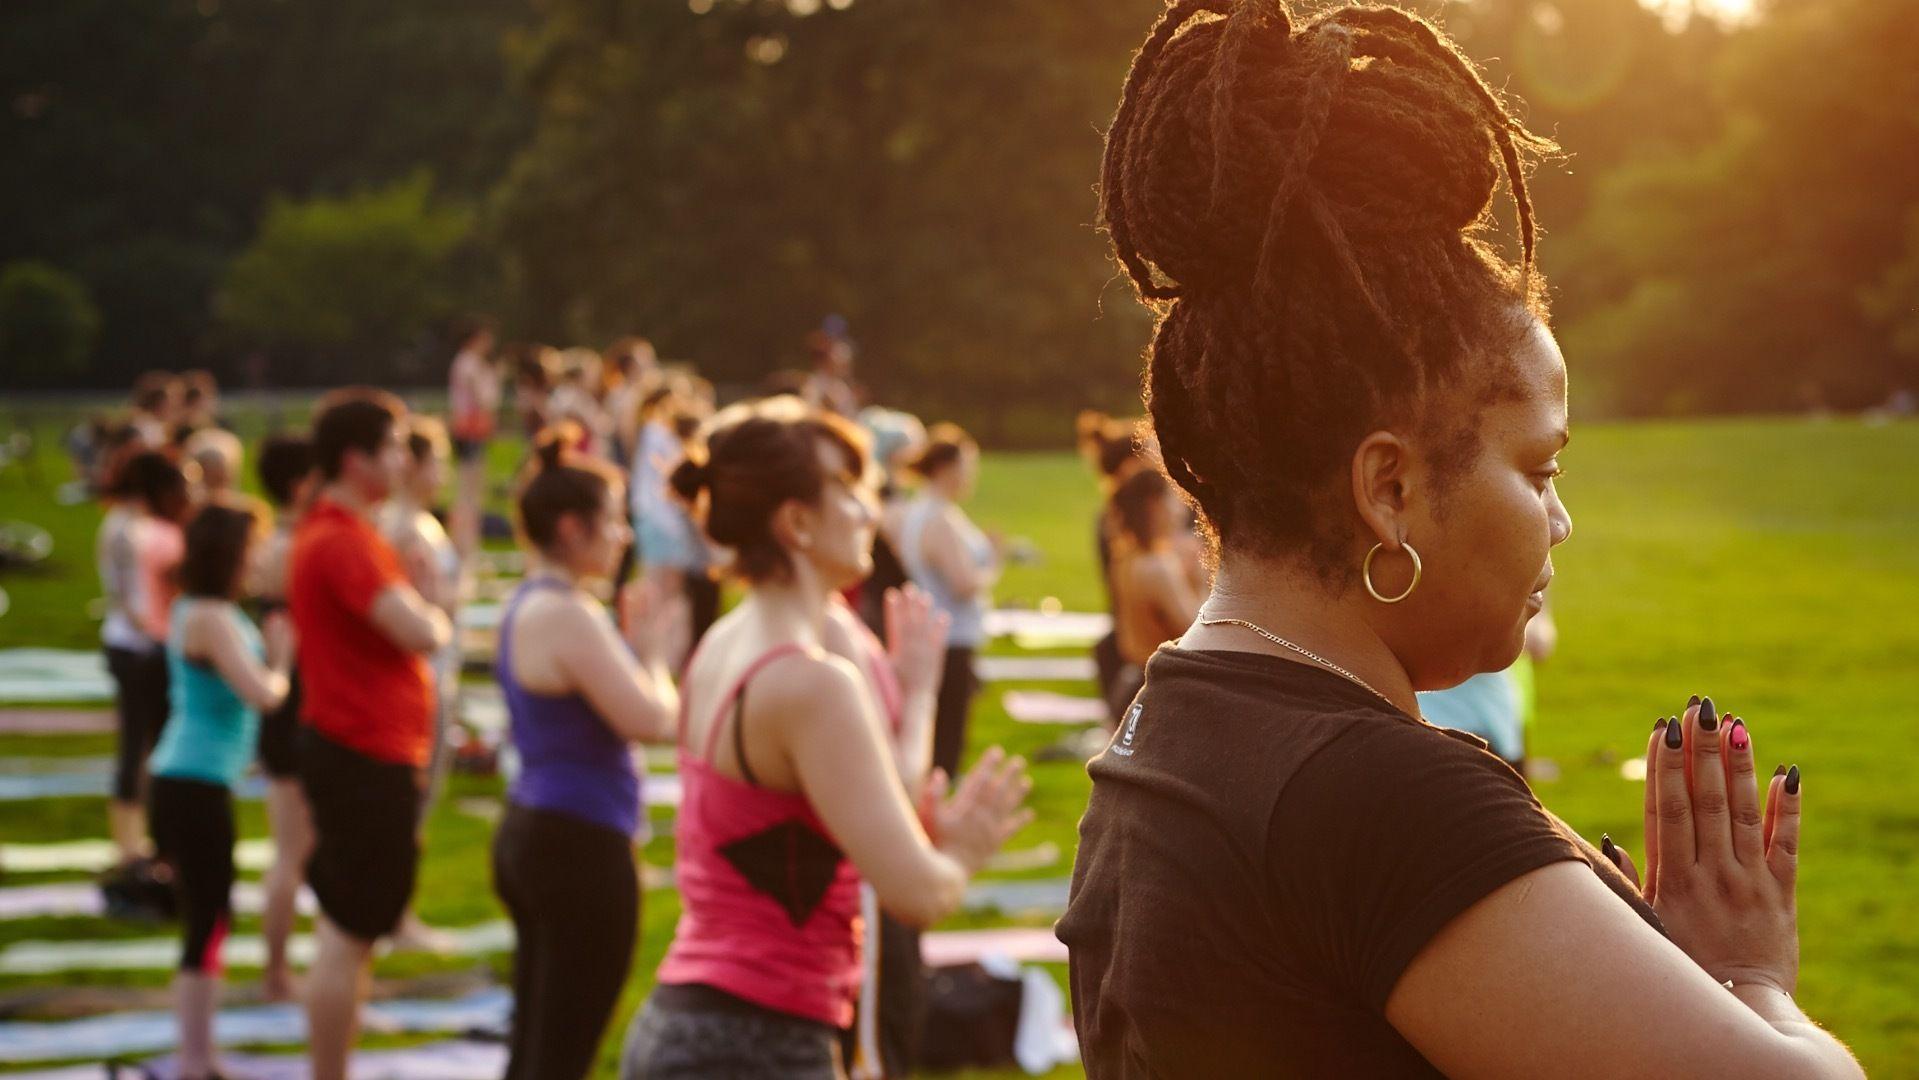 Free Yoga in Prospect Park